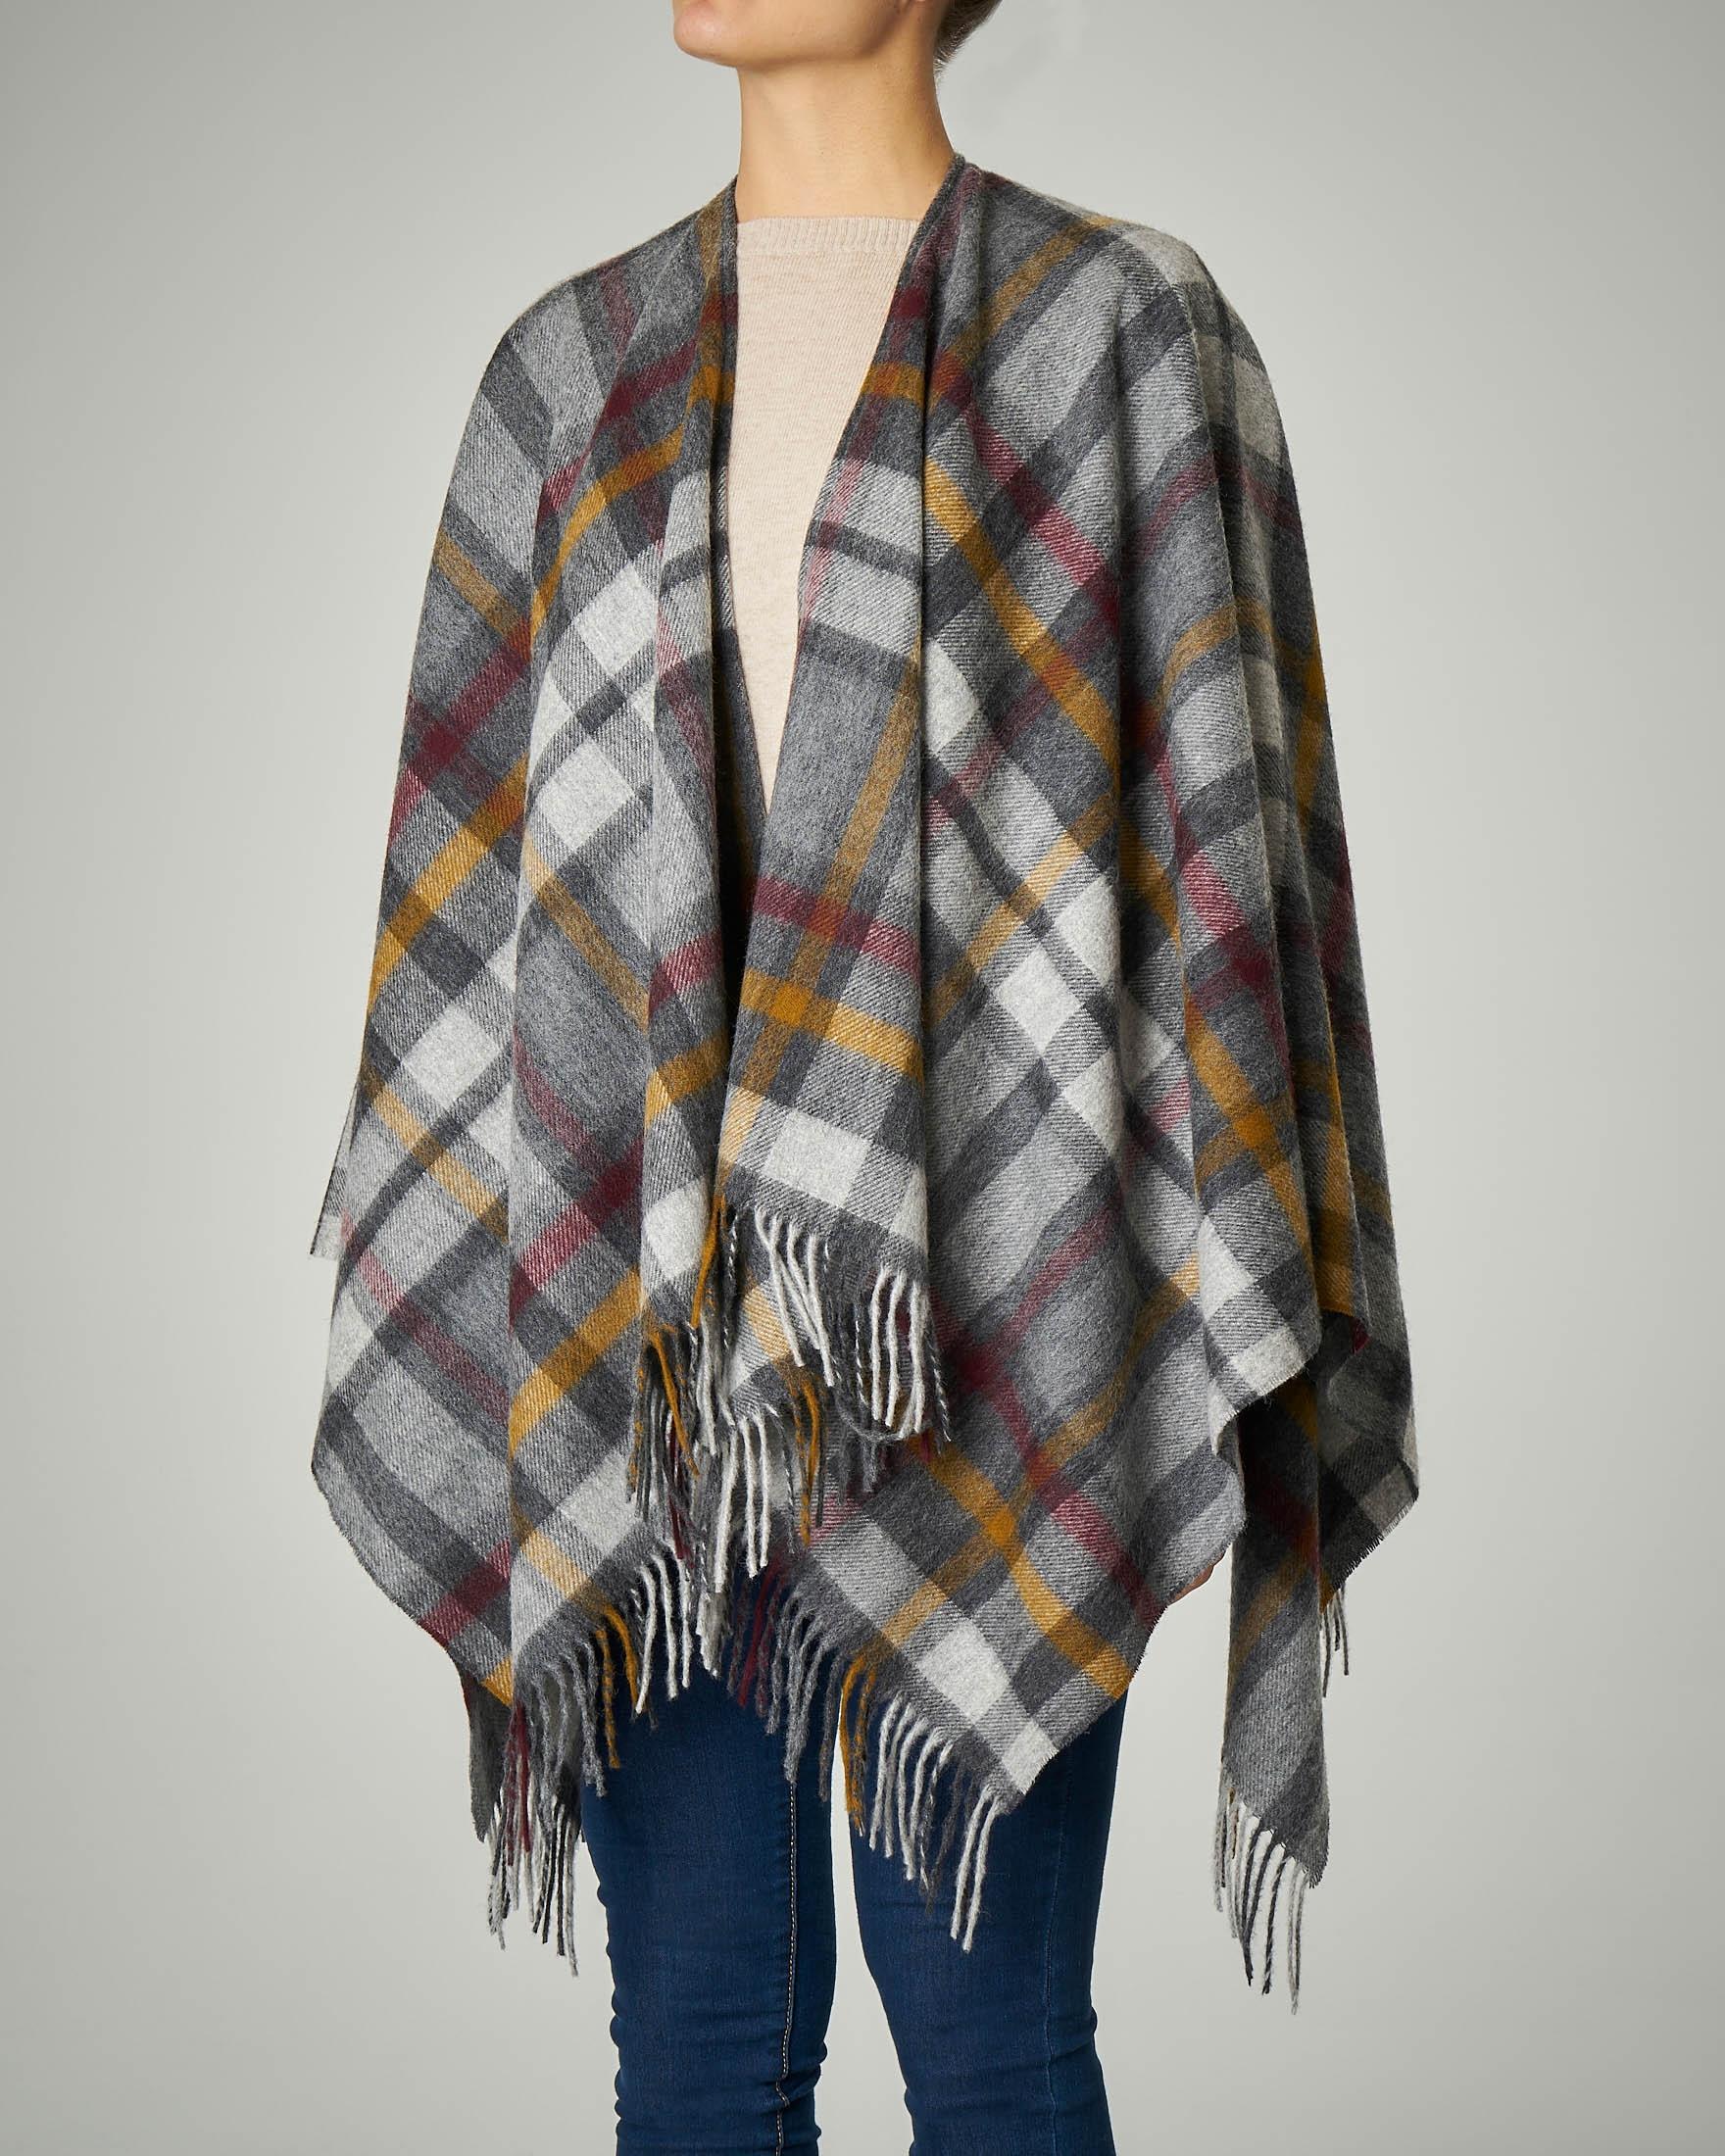 Poncho in lana merino a fantasia tartan grigio con frange